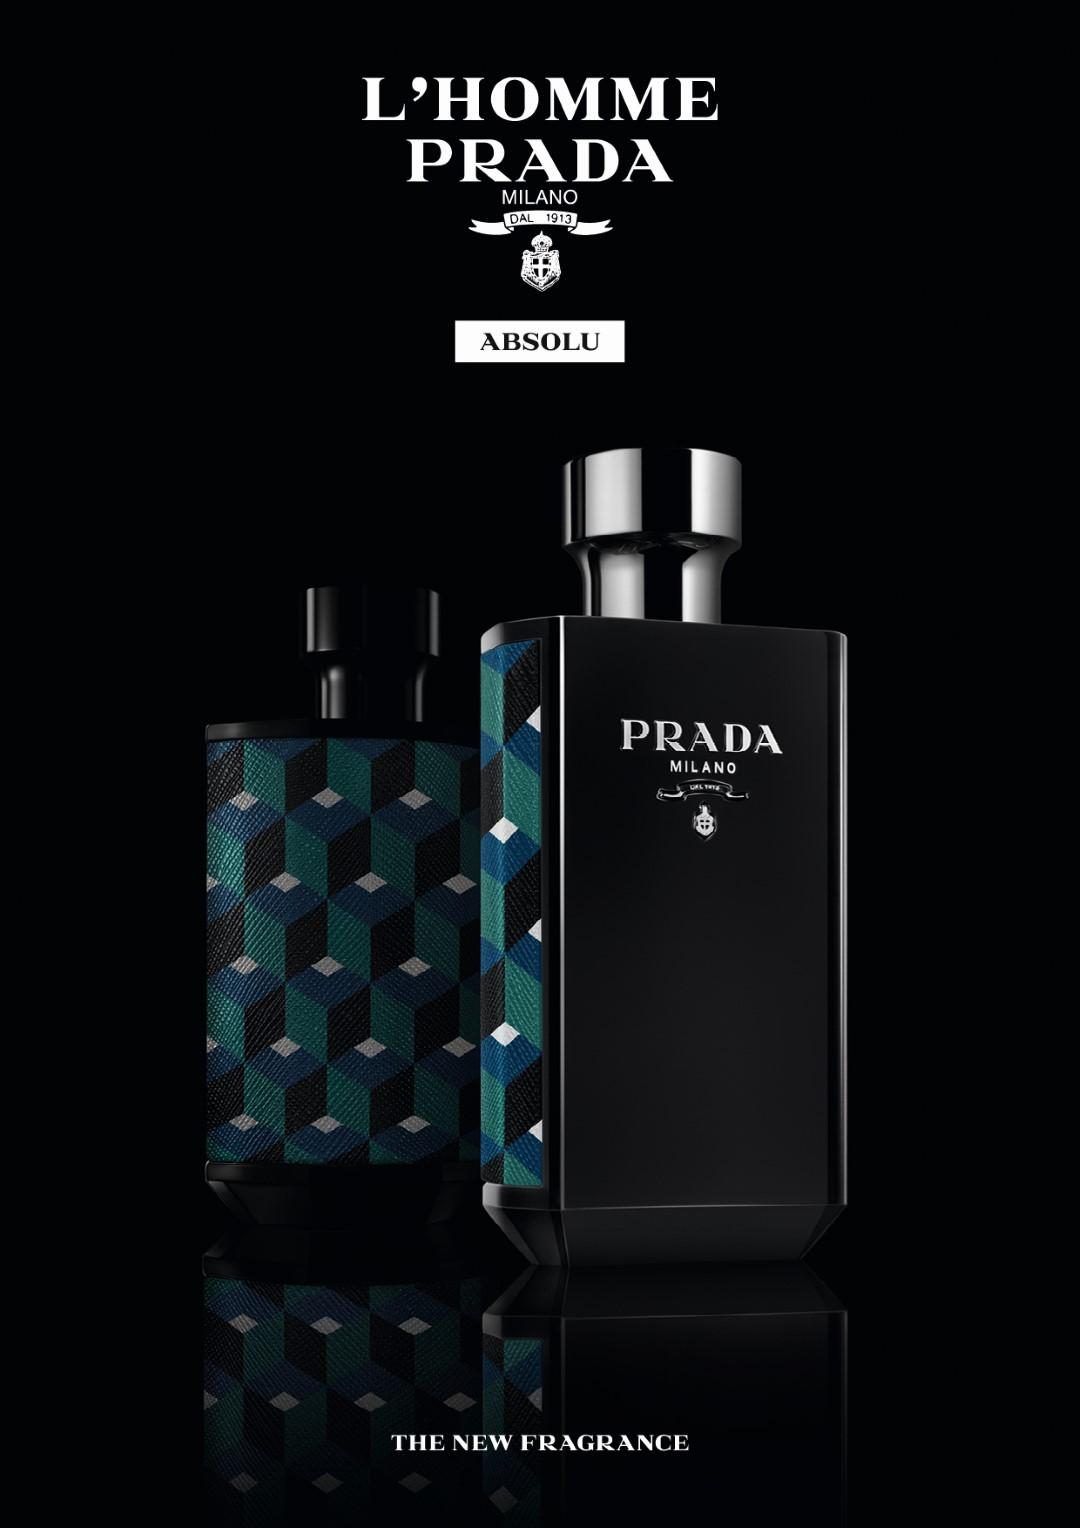 d04b423e7 إطلاق عطري «L'Homme Prada Absolu» و «La Femme Prada Absolu»   مجلة الرجل